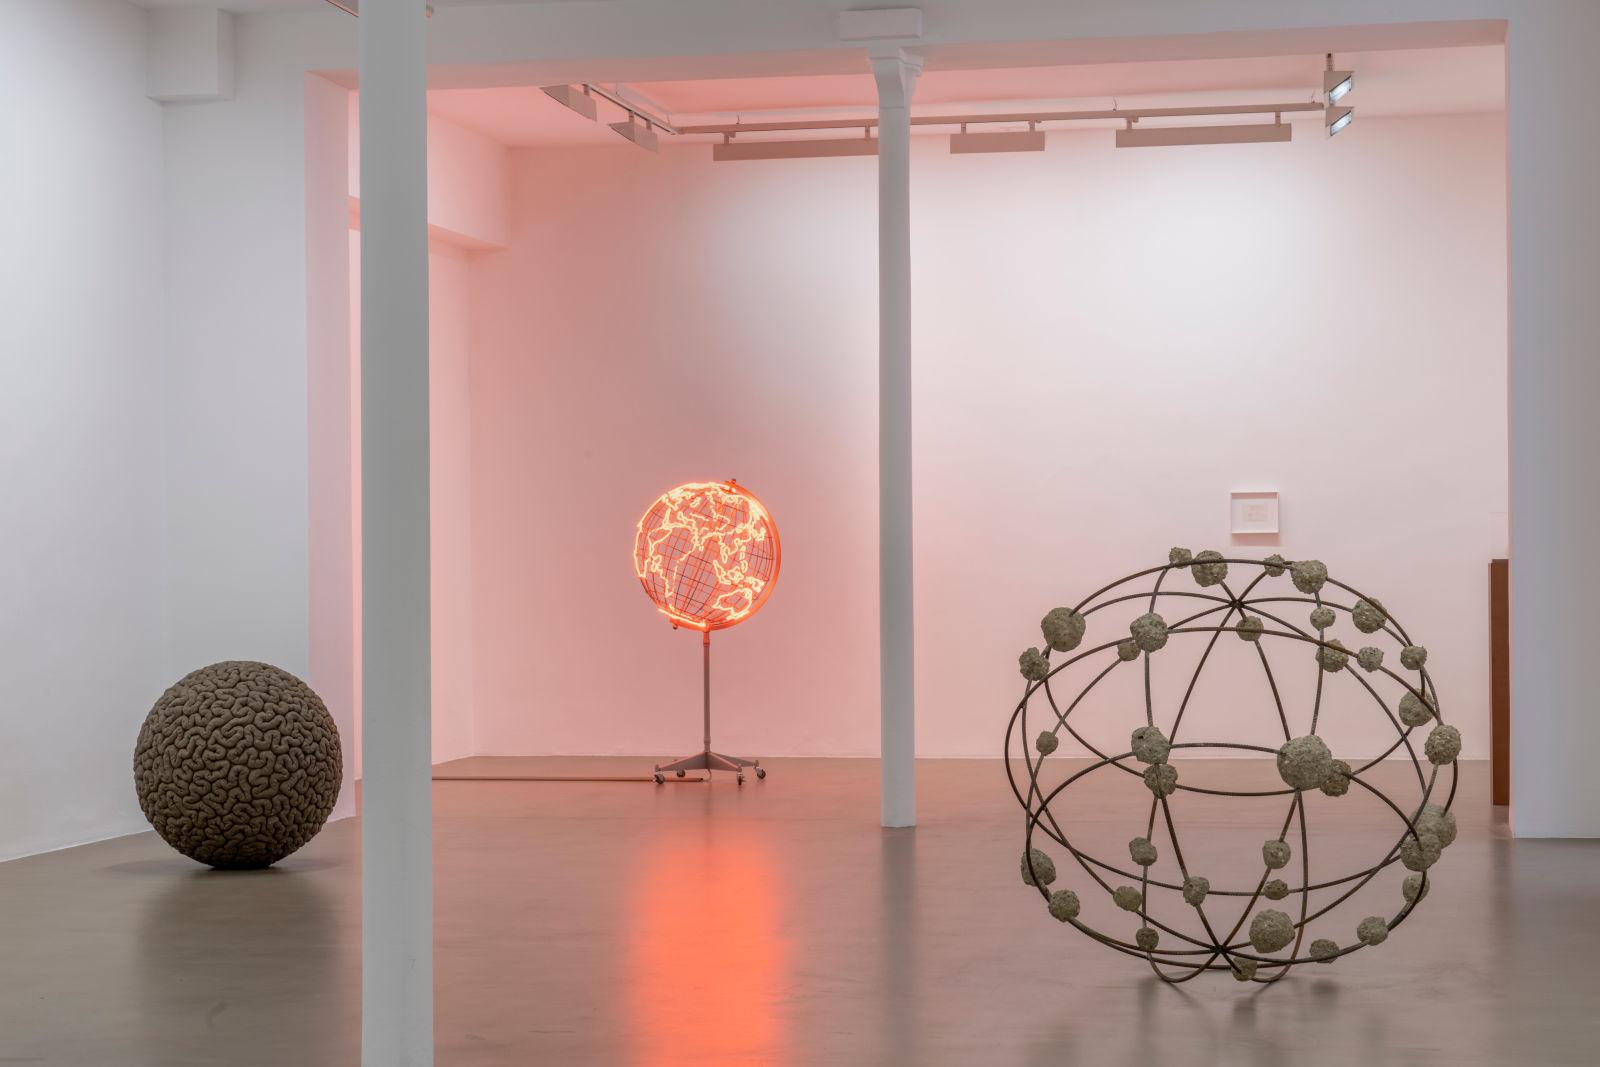 Galerie Chantal Crousel Mona Hatoum 1